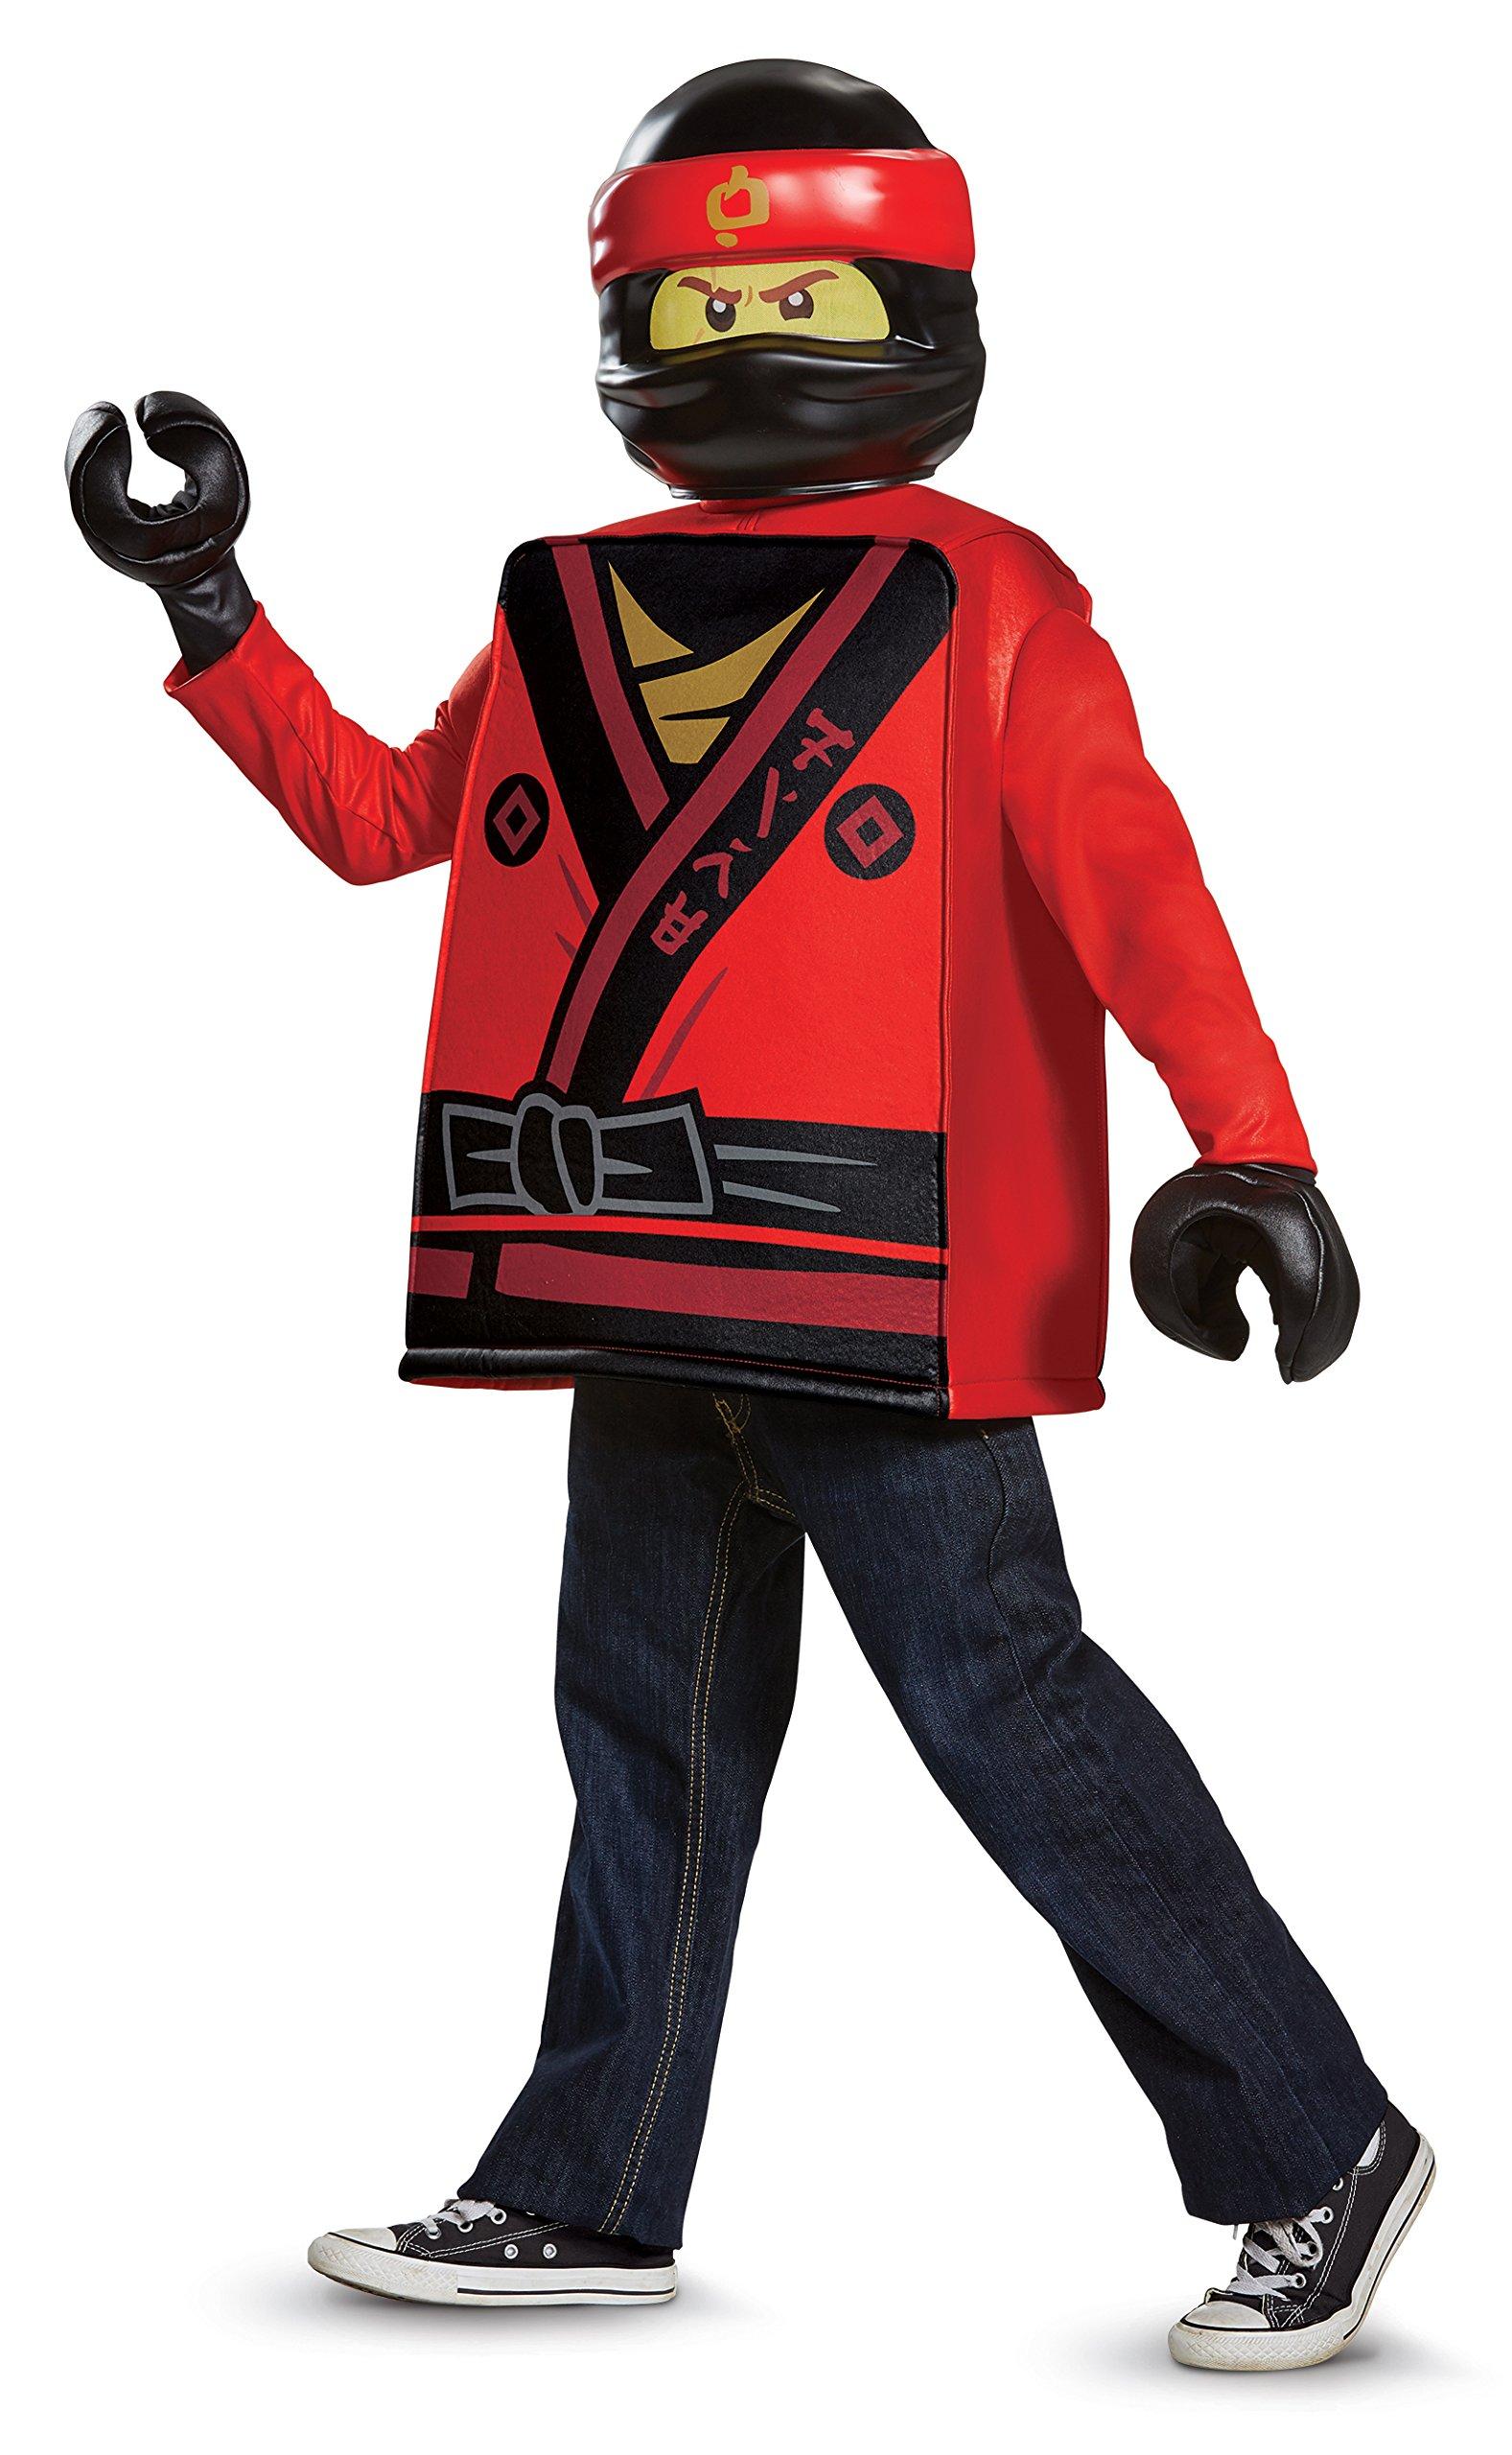 Lego Ninjago Kai 23480K Movie Classic costume, 7 - 8anni 3 spesavip